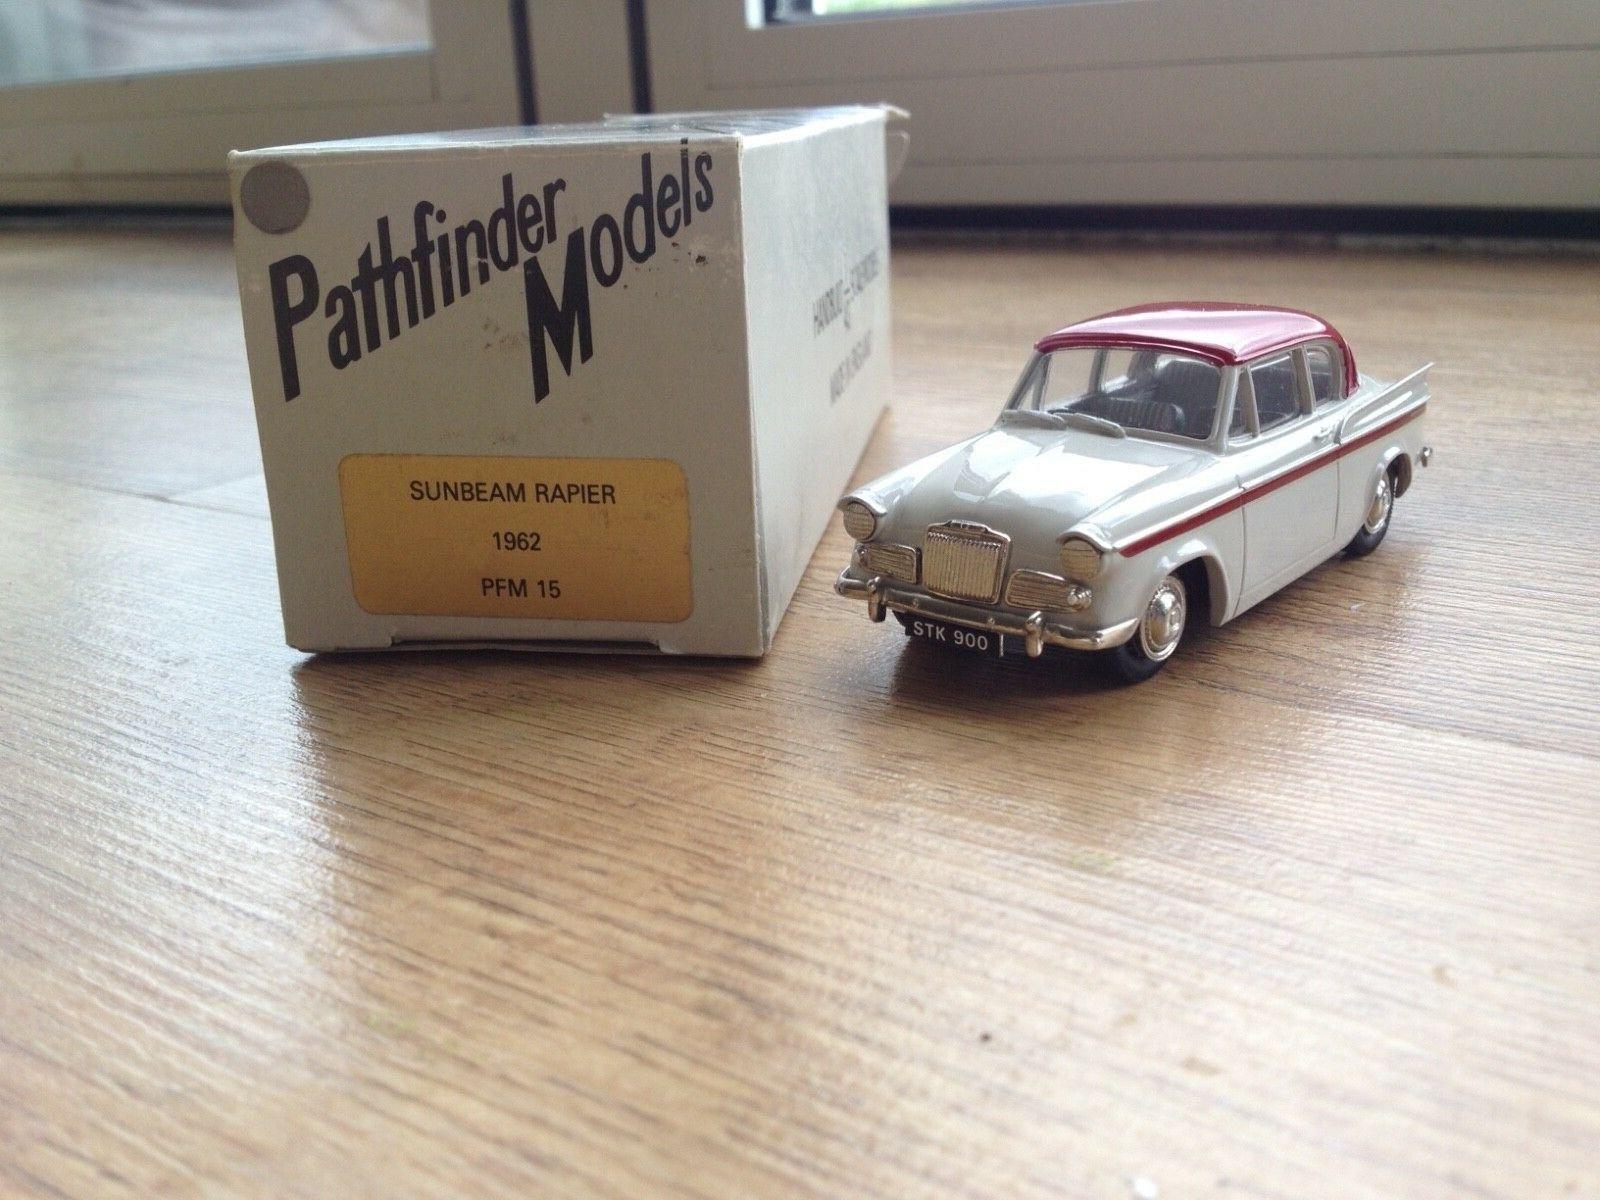 PATHFINDER modelli SUNBEAM Rapier 1962 PFM 15